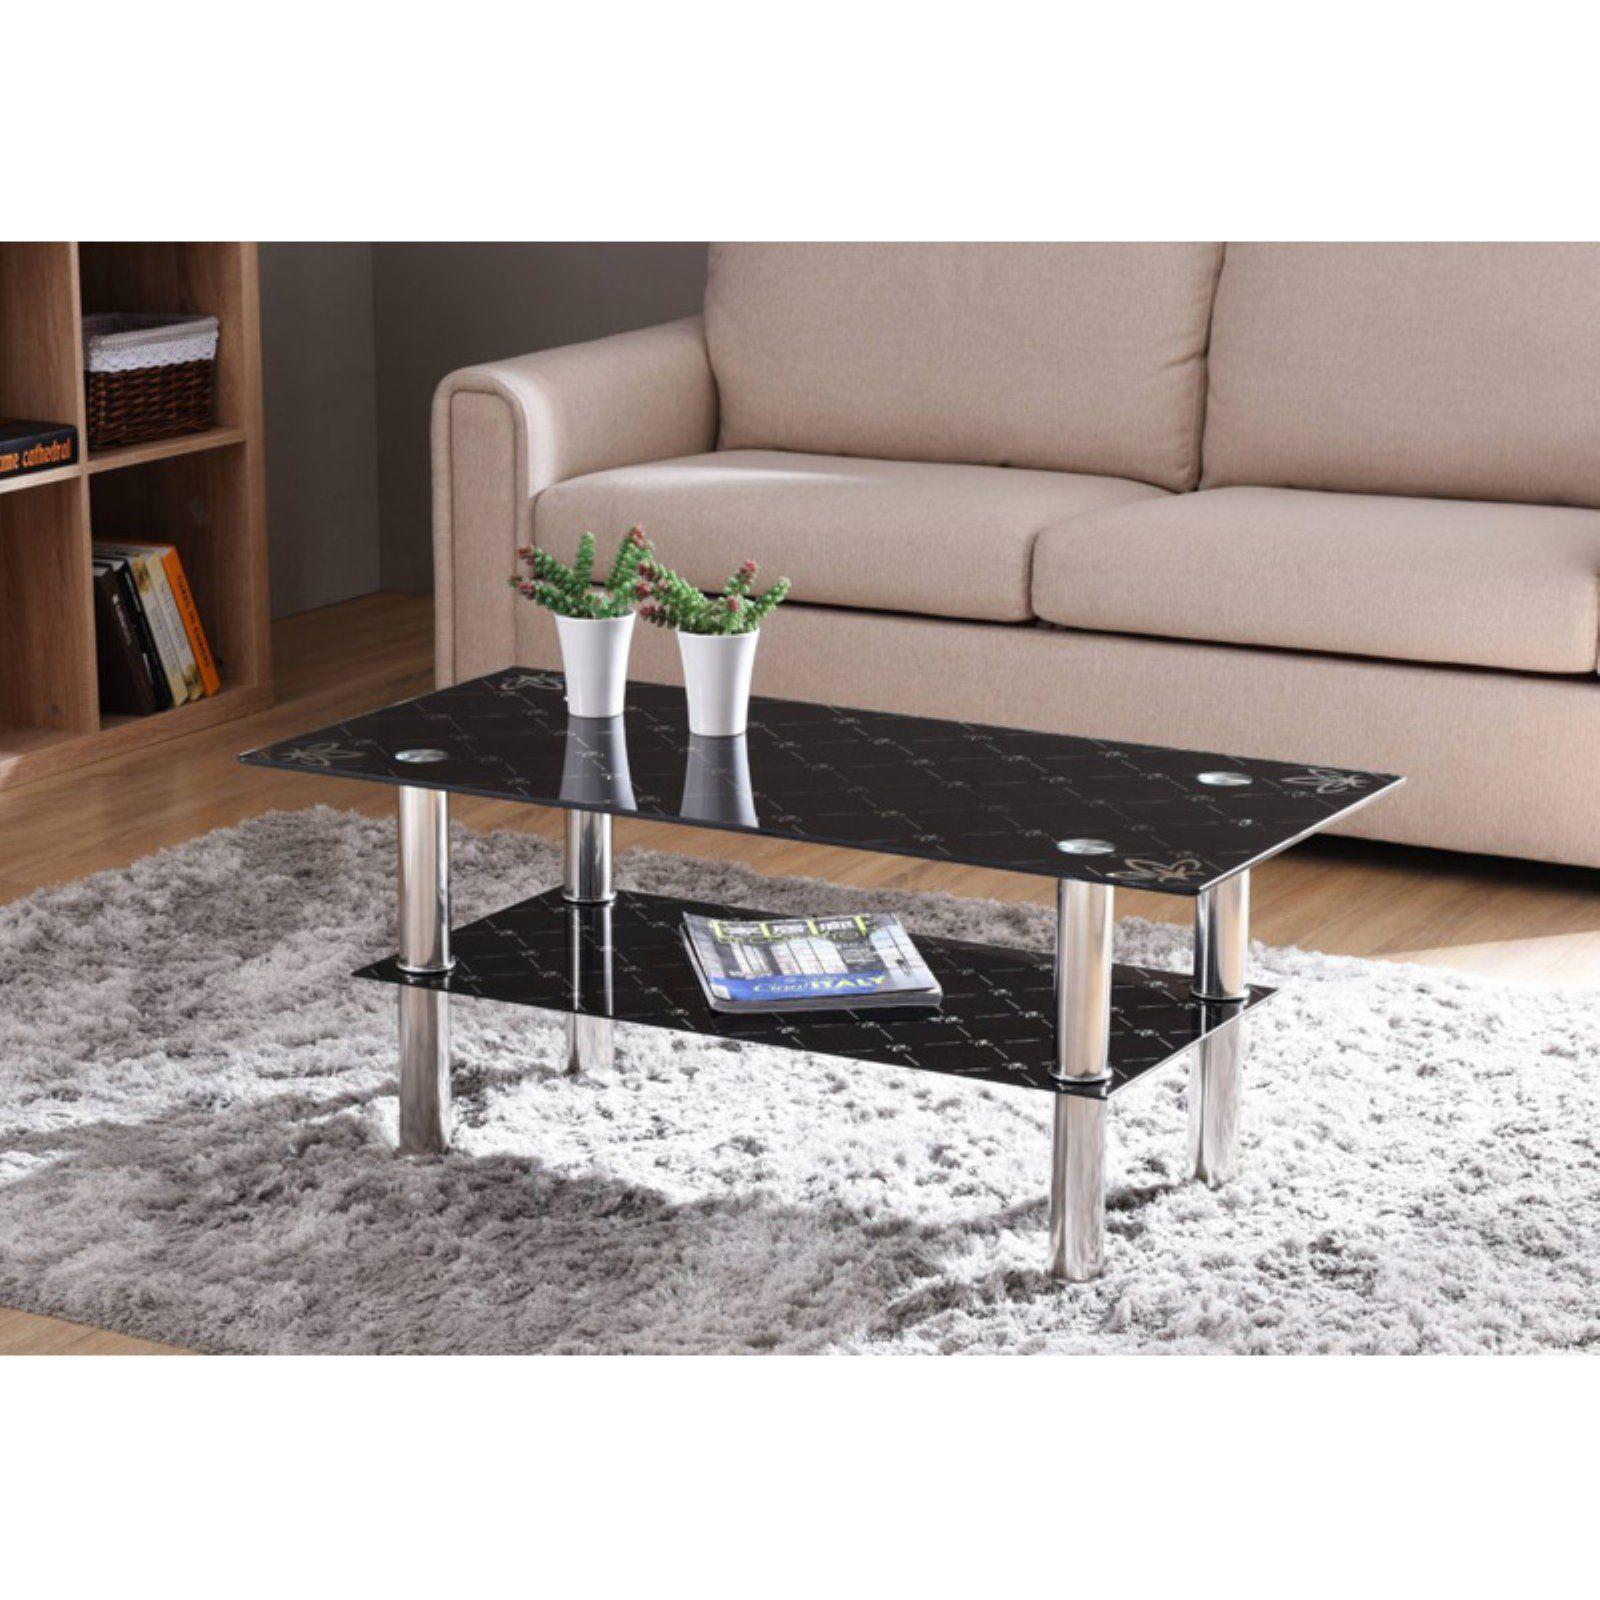 Hodedah Hict22 Rectangular Coffee Table Coffee Table Round Wood Coffee Table Black Glass Coffee Table [ 1600 x 1600 Pixel ]